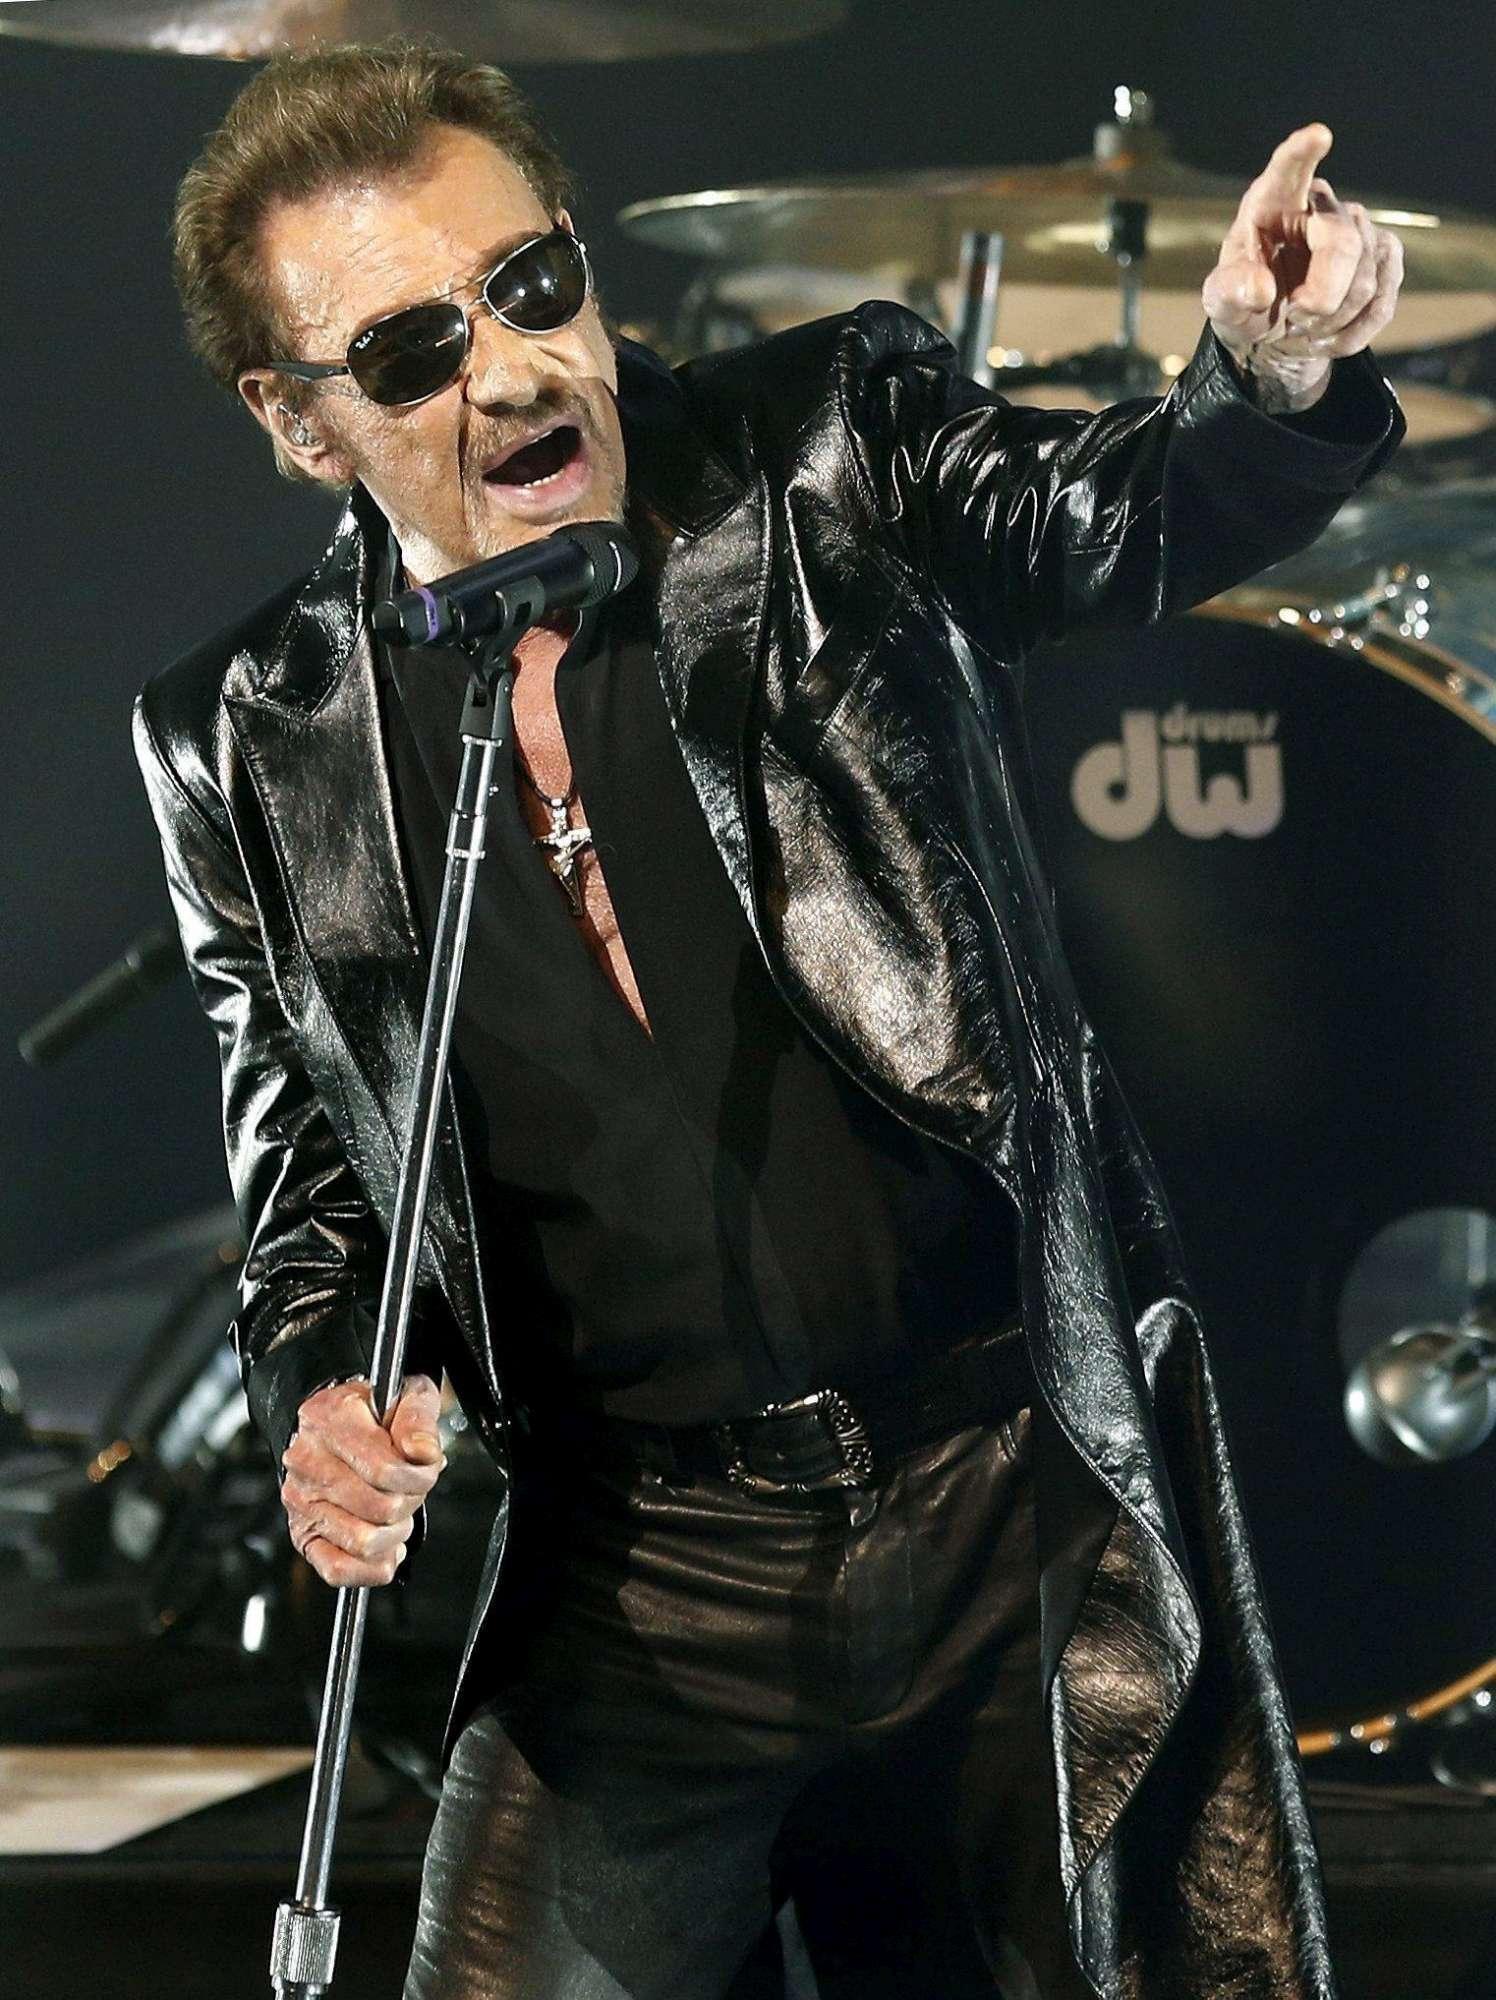 Addio a Johnny Hallyday: la carriera della rockstar in foto